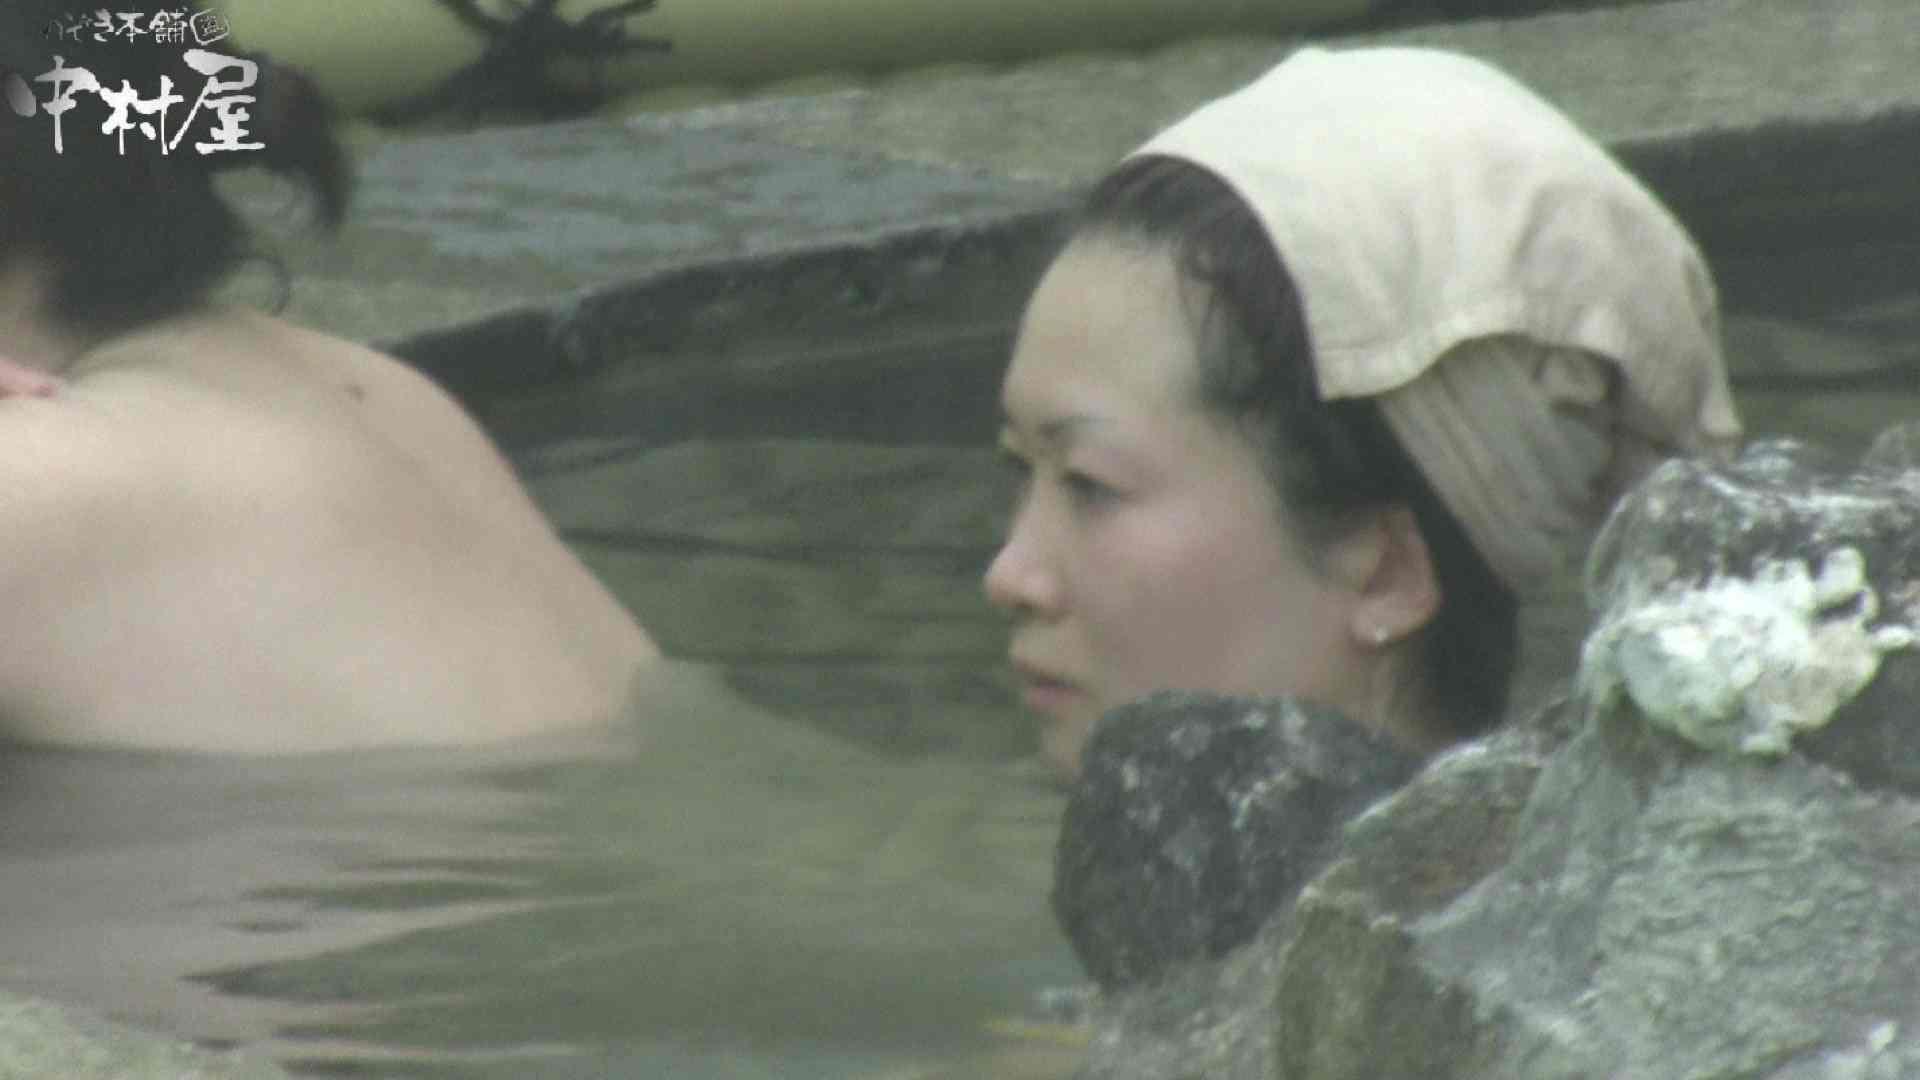 Aquaな露天風呂Vol.906 OLセックス 盗撮オマンコ無修正動画無料 92画像 83